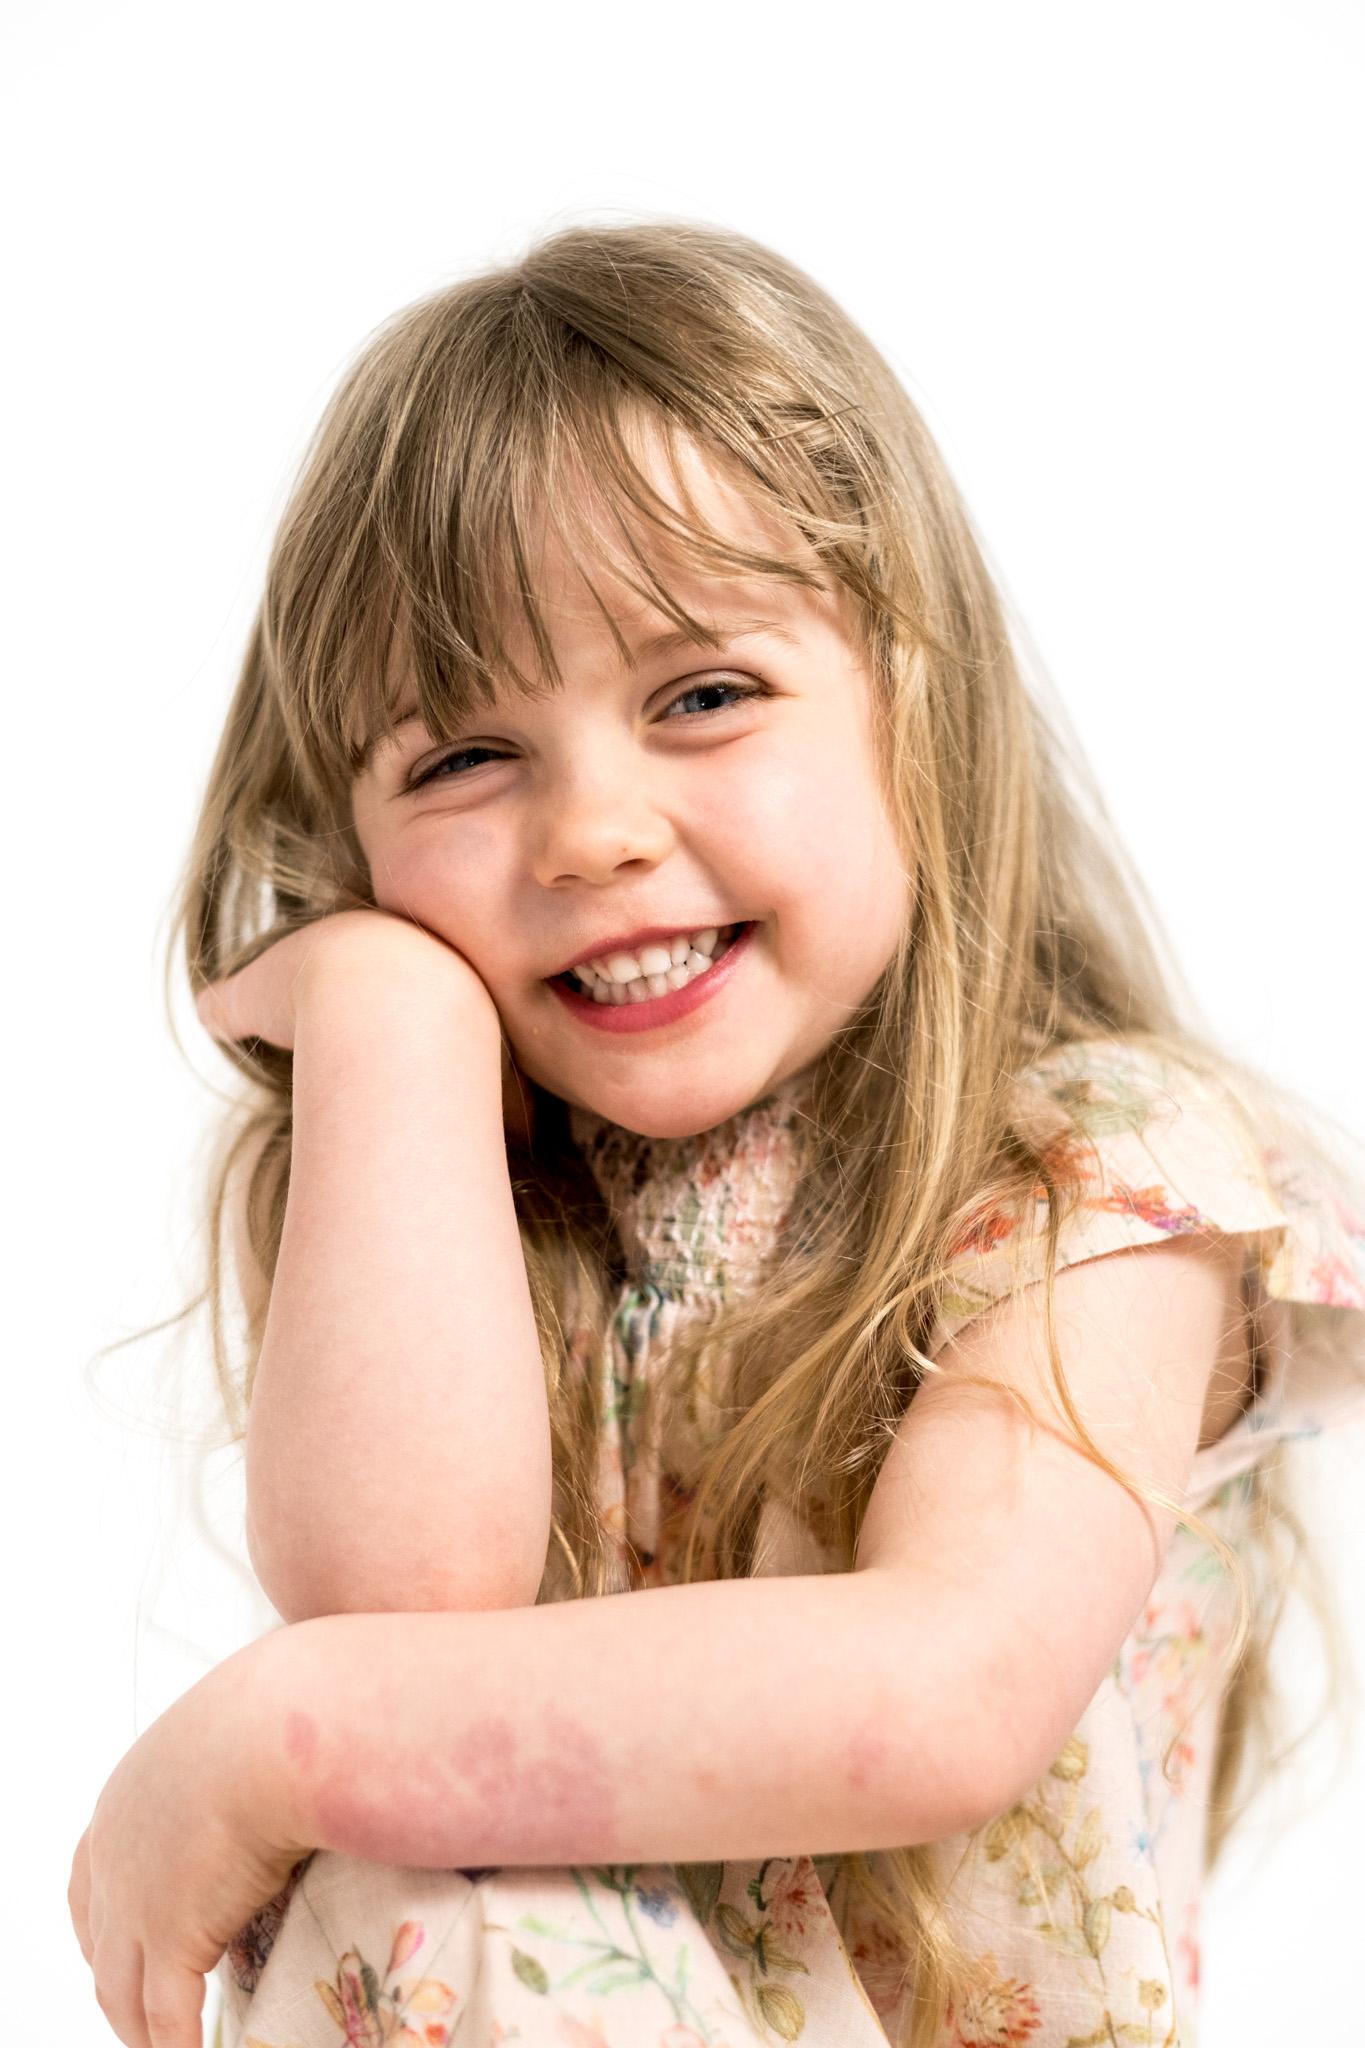 Childrens portrait Photographer